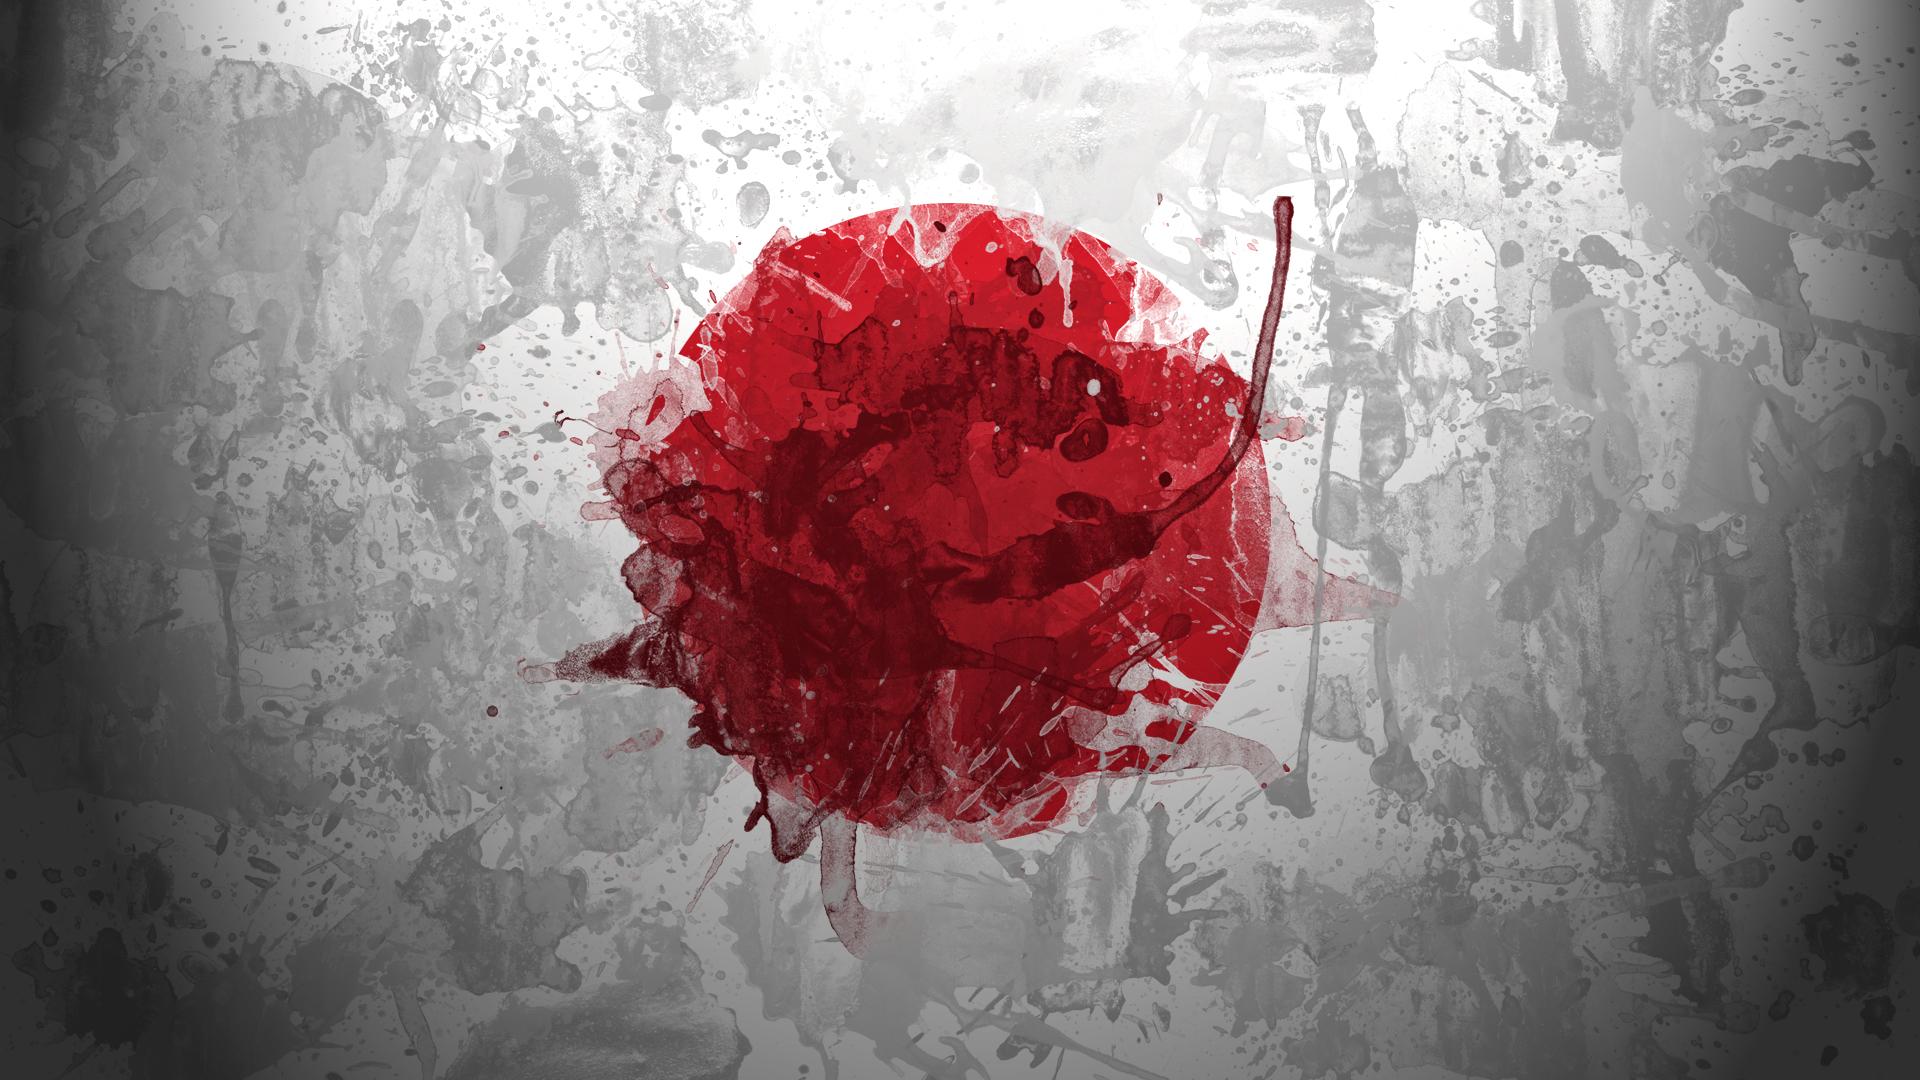 Japan Flag Art 2013 Wallpaper High Quality WallpapersWallpaper 1920x1080